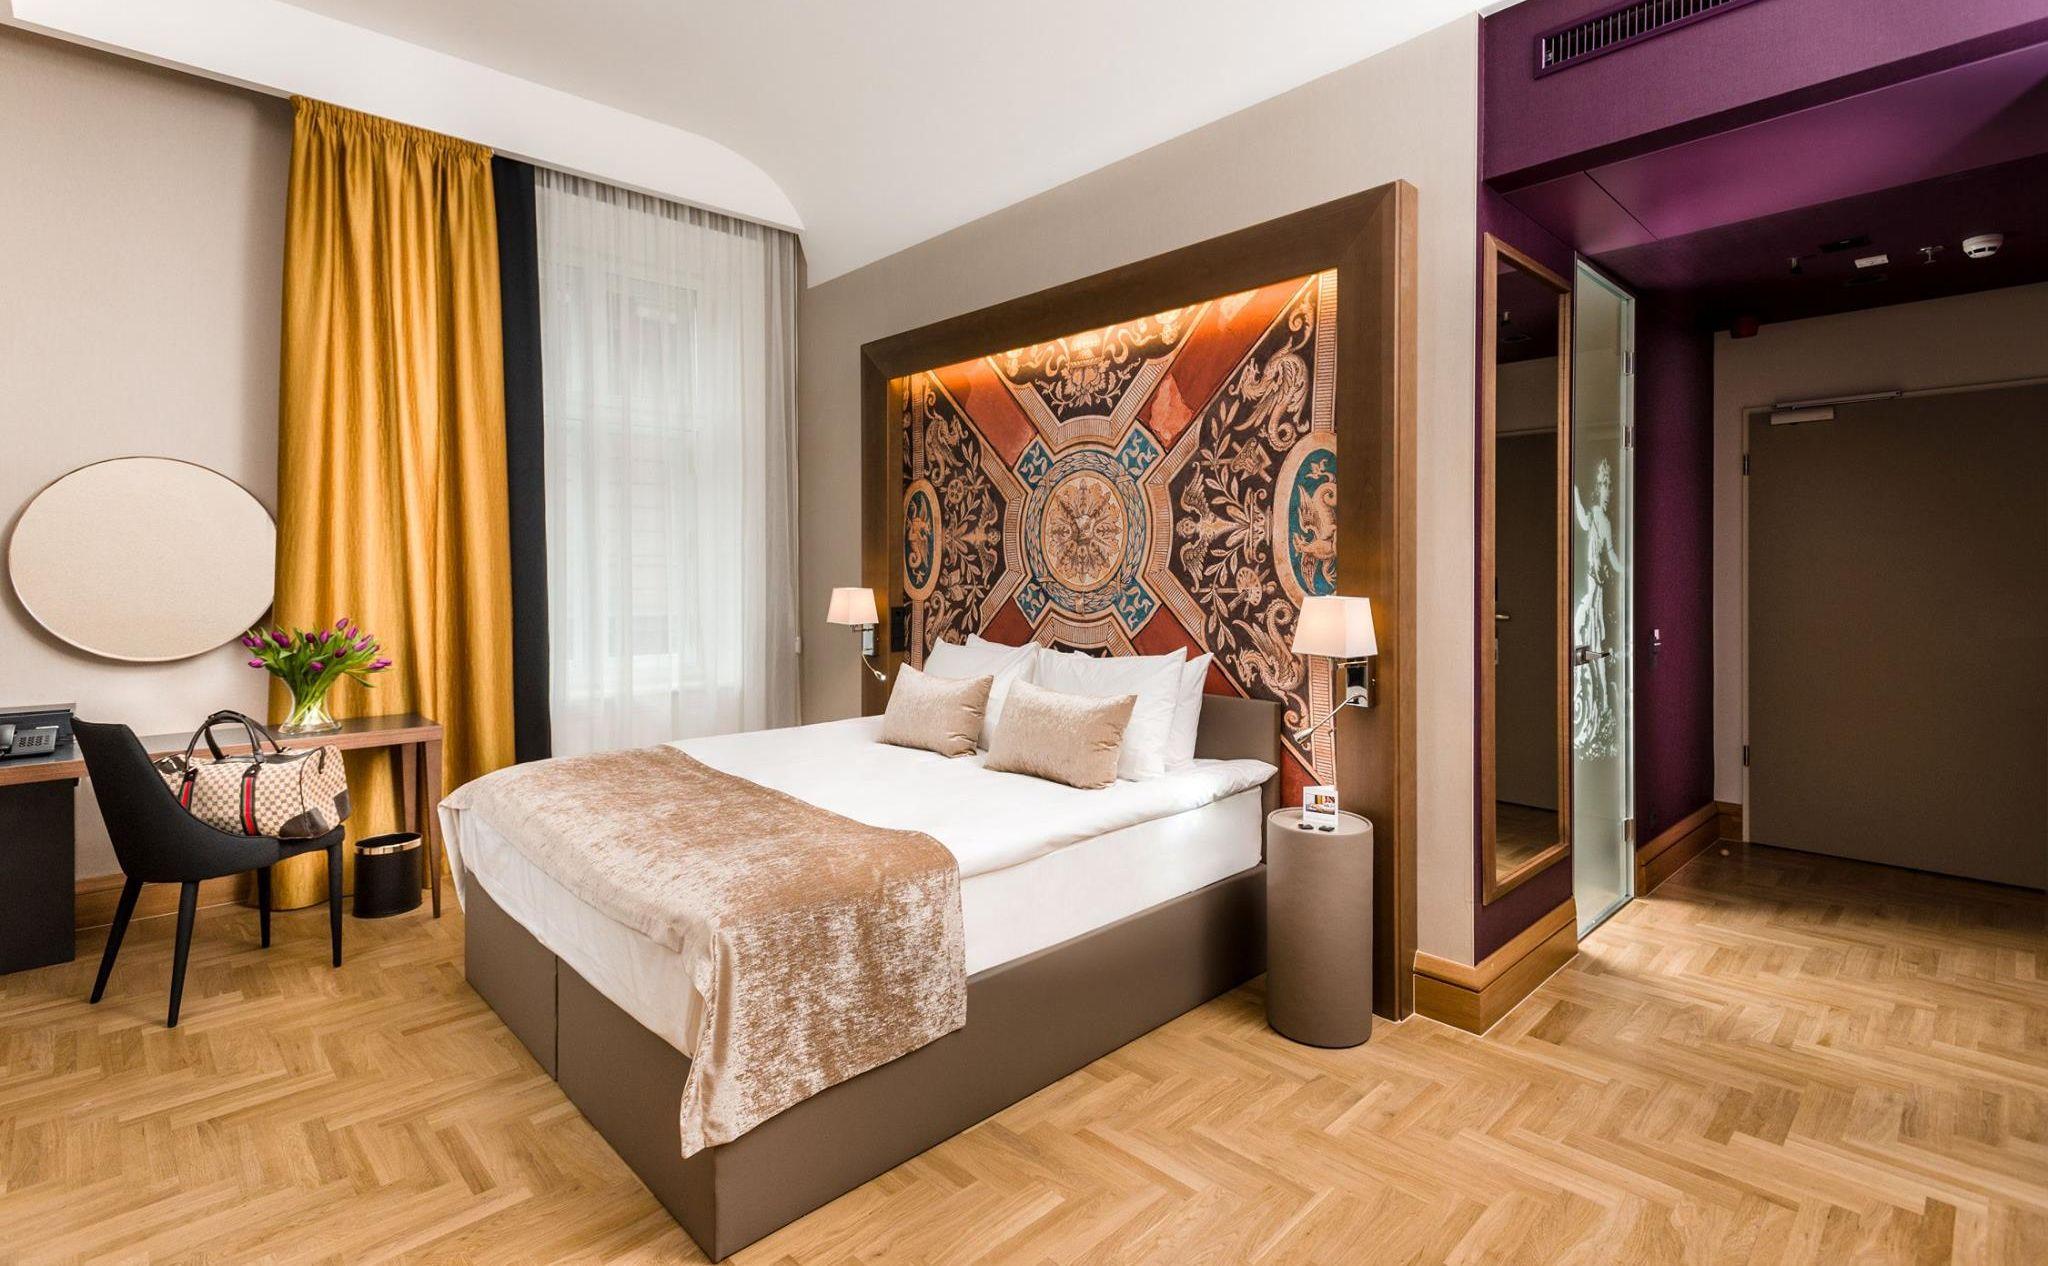 Hotel Moments Budapest מלונות בבודפשט 4 כוכבים